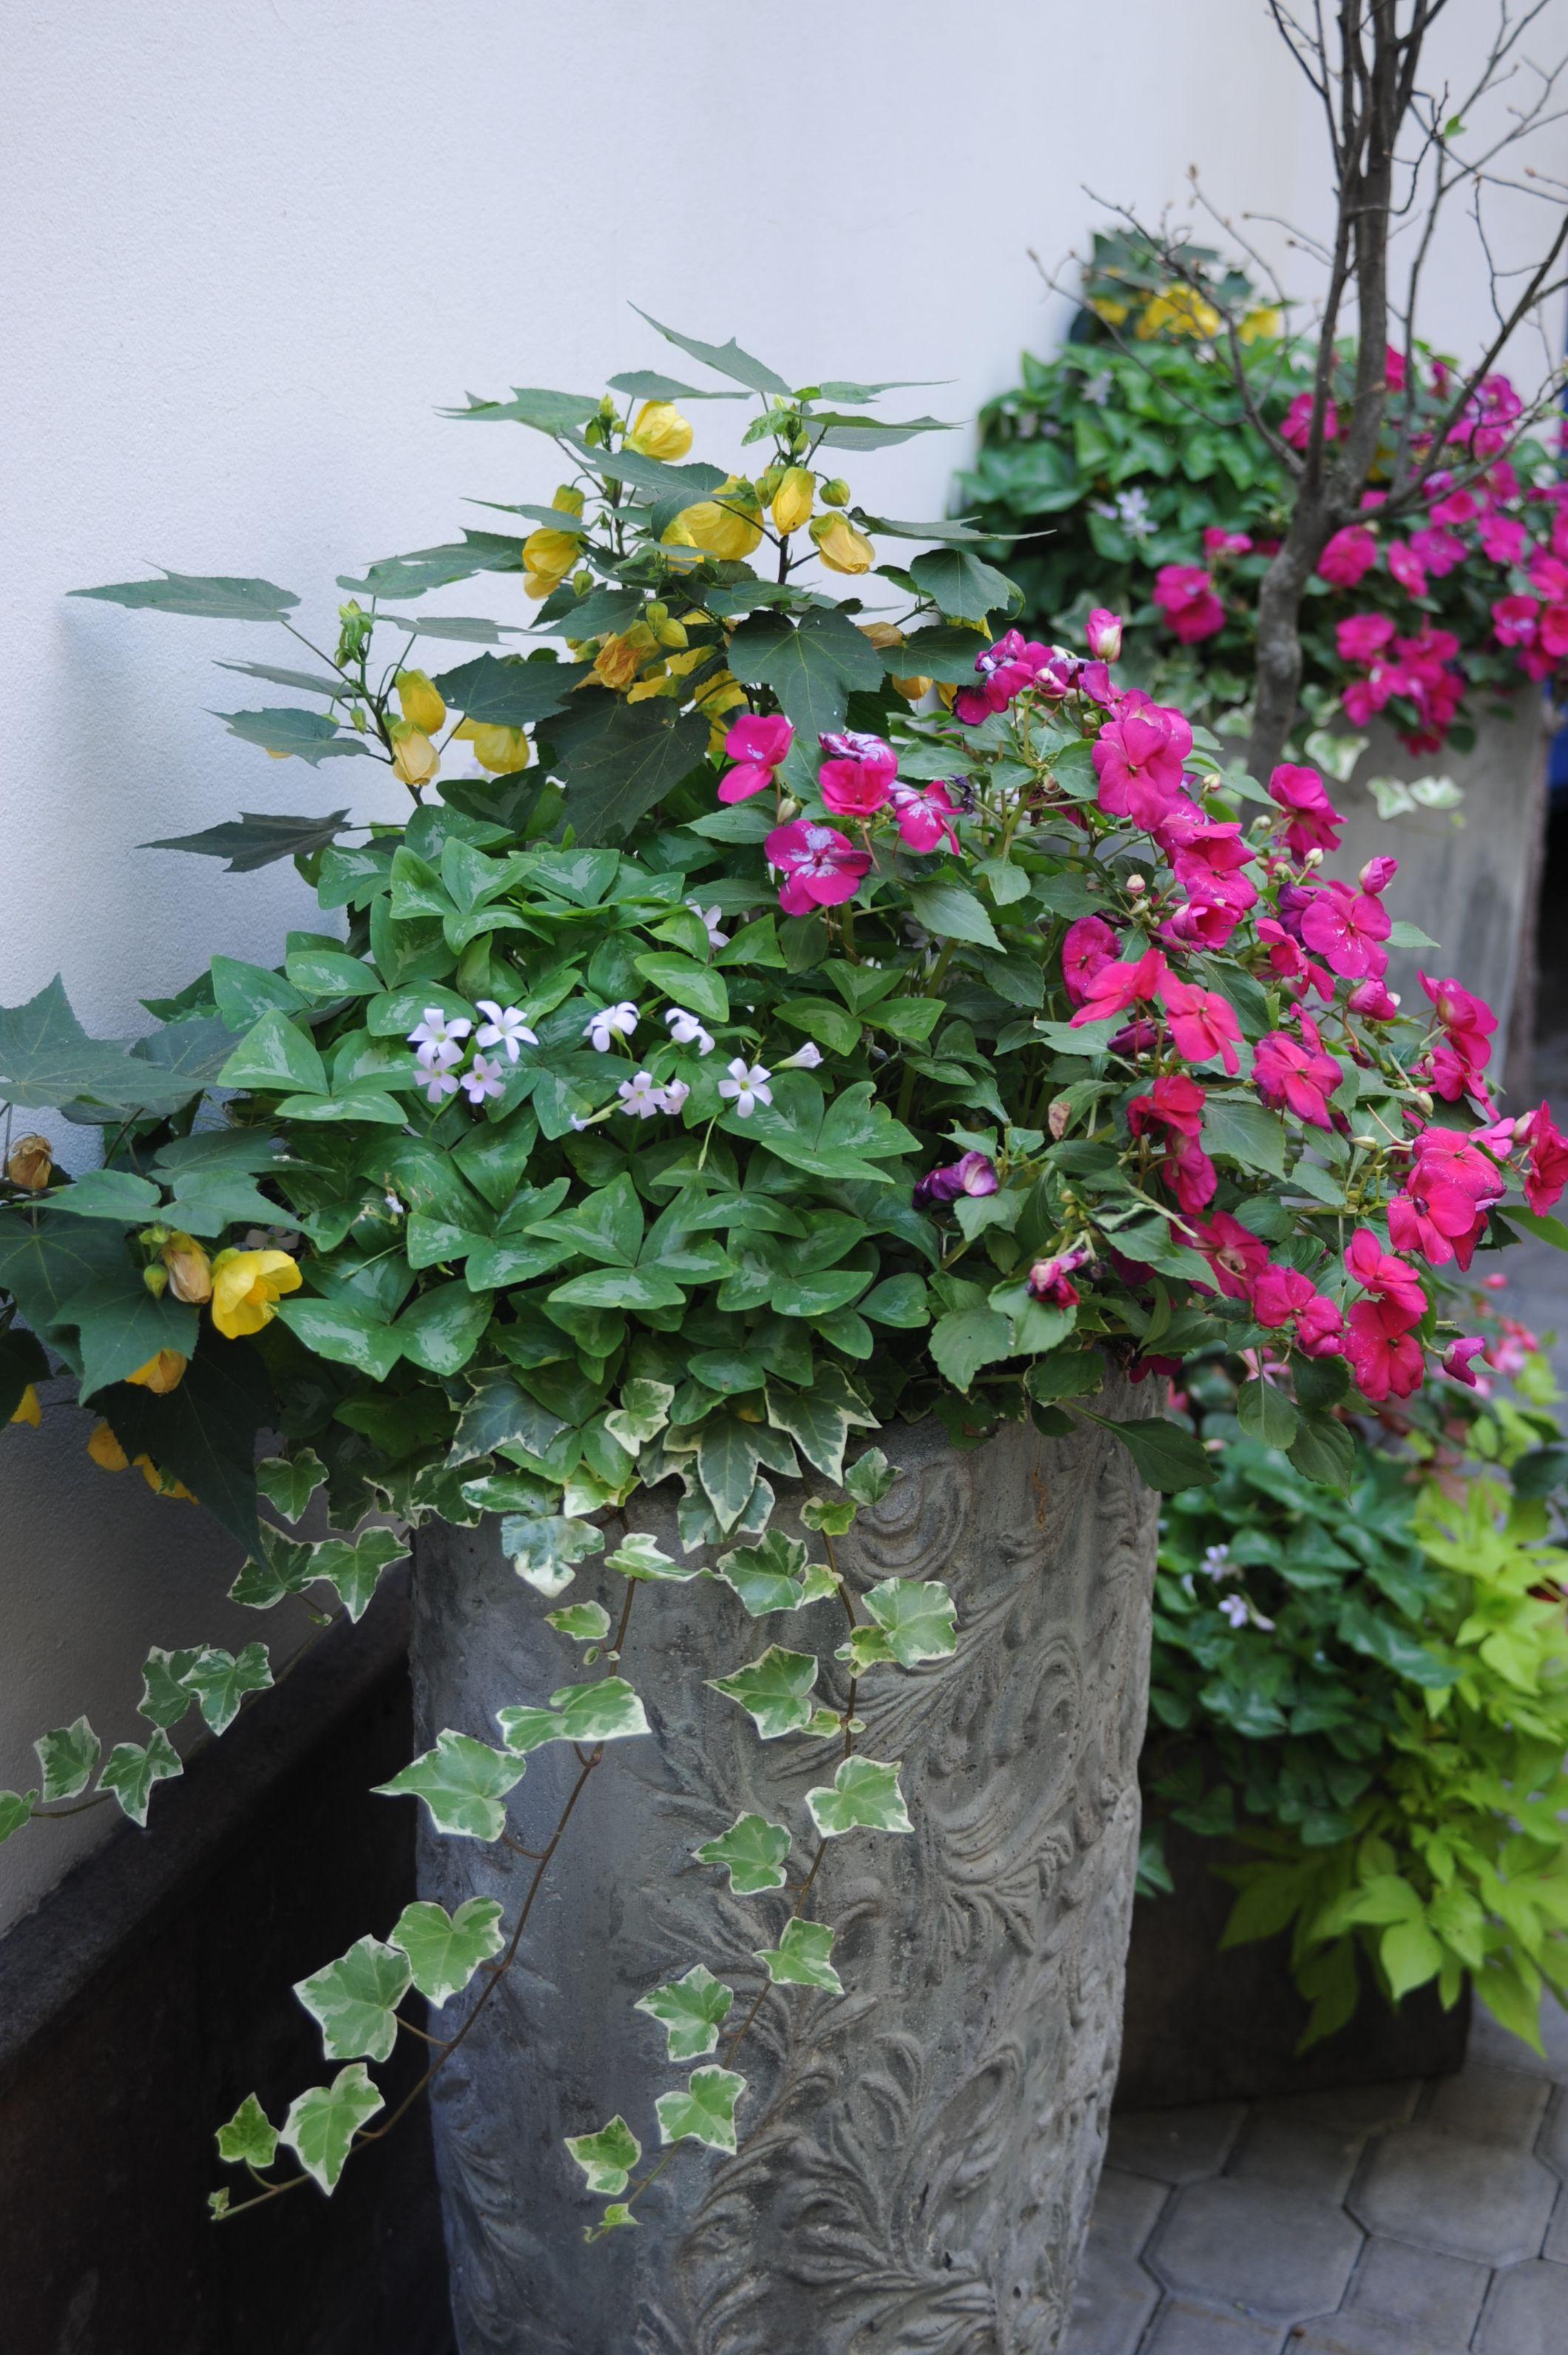 Ogrod Lobzow Ogrod Lobzow Container Gardening Plants Container